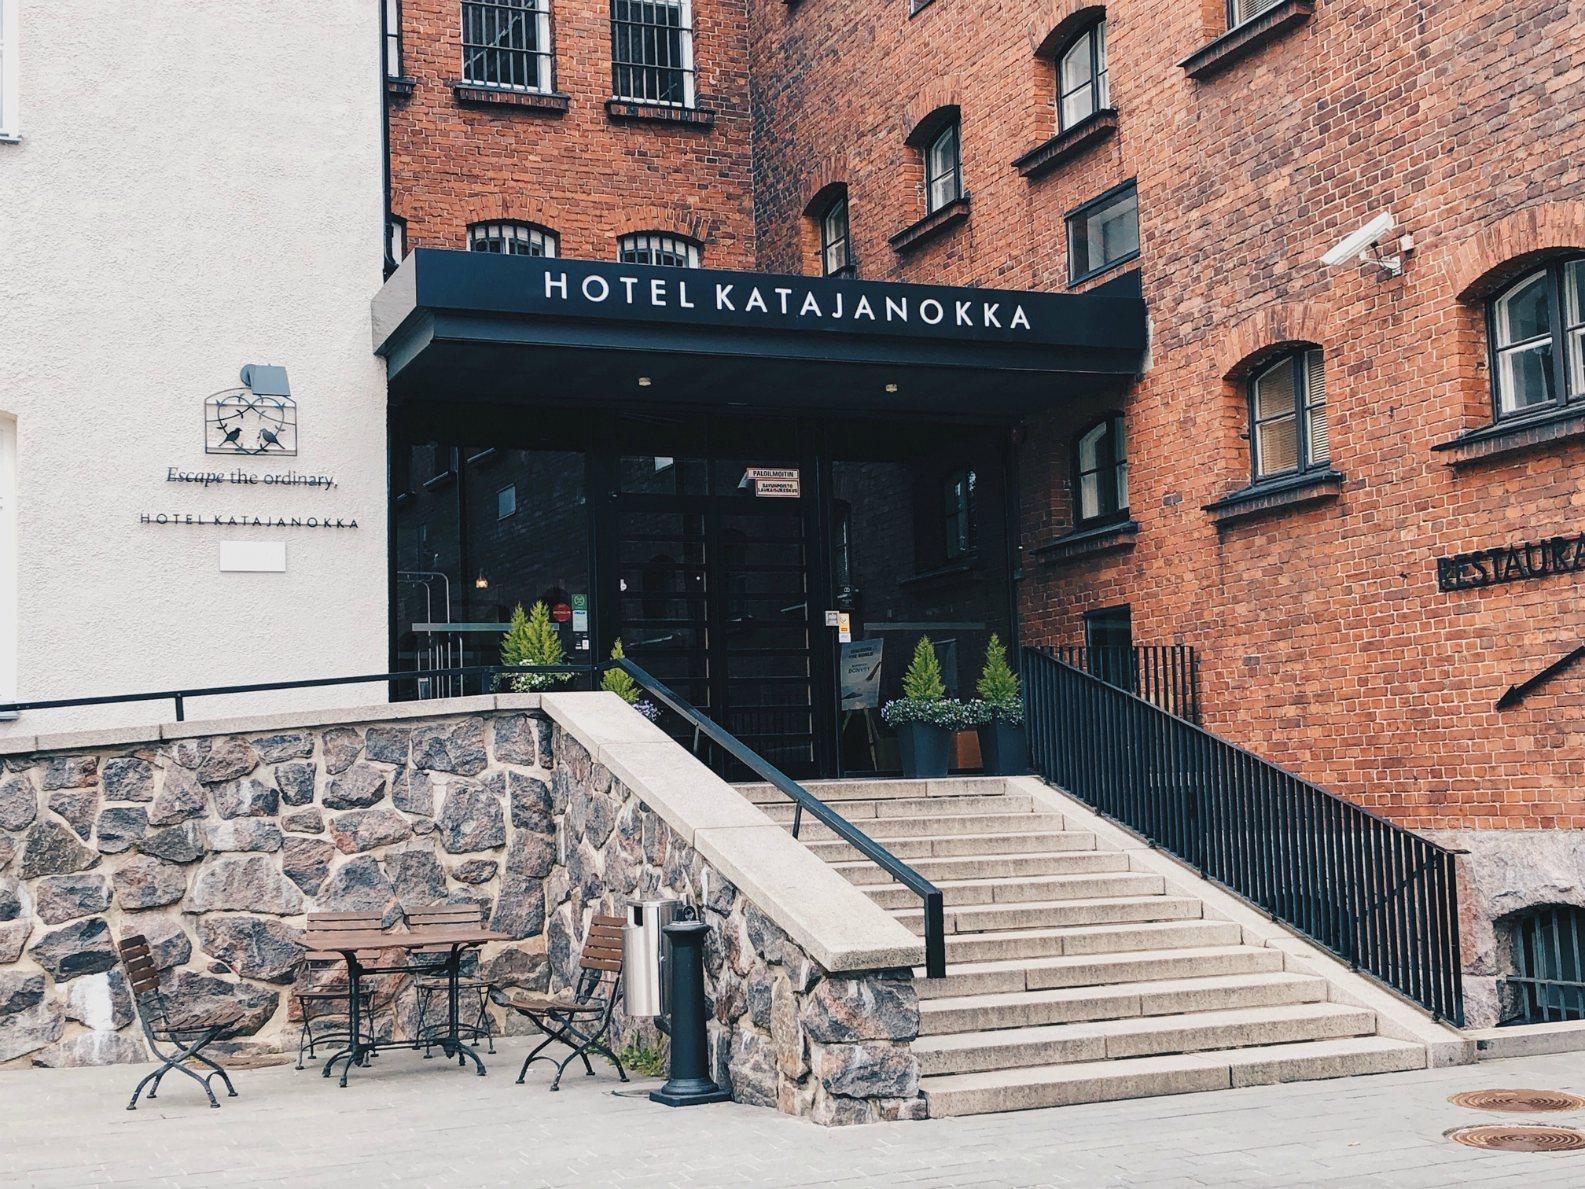 Hotel Katajanokka in Helsinki